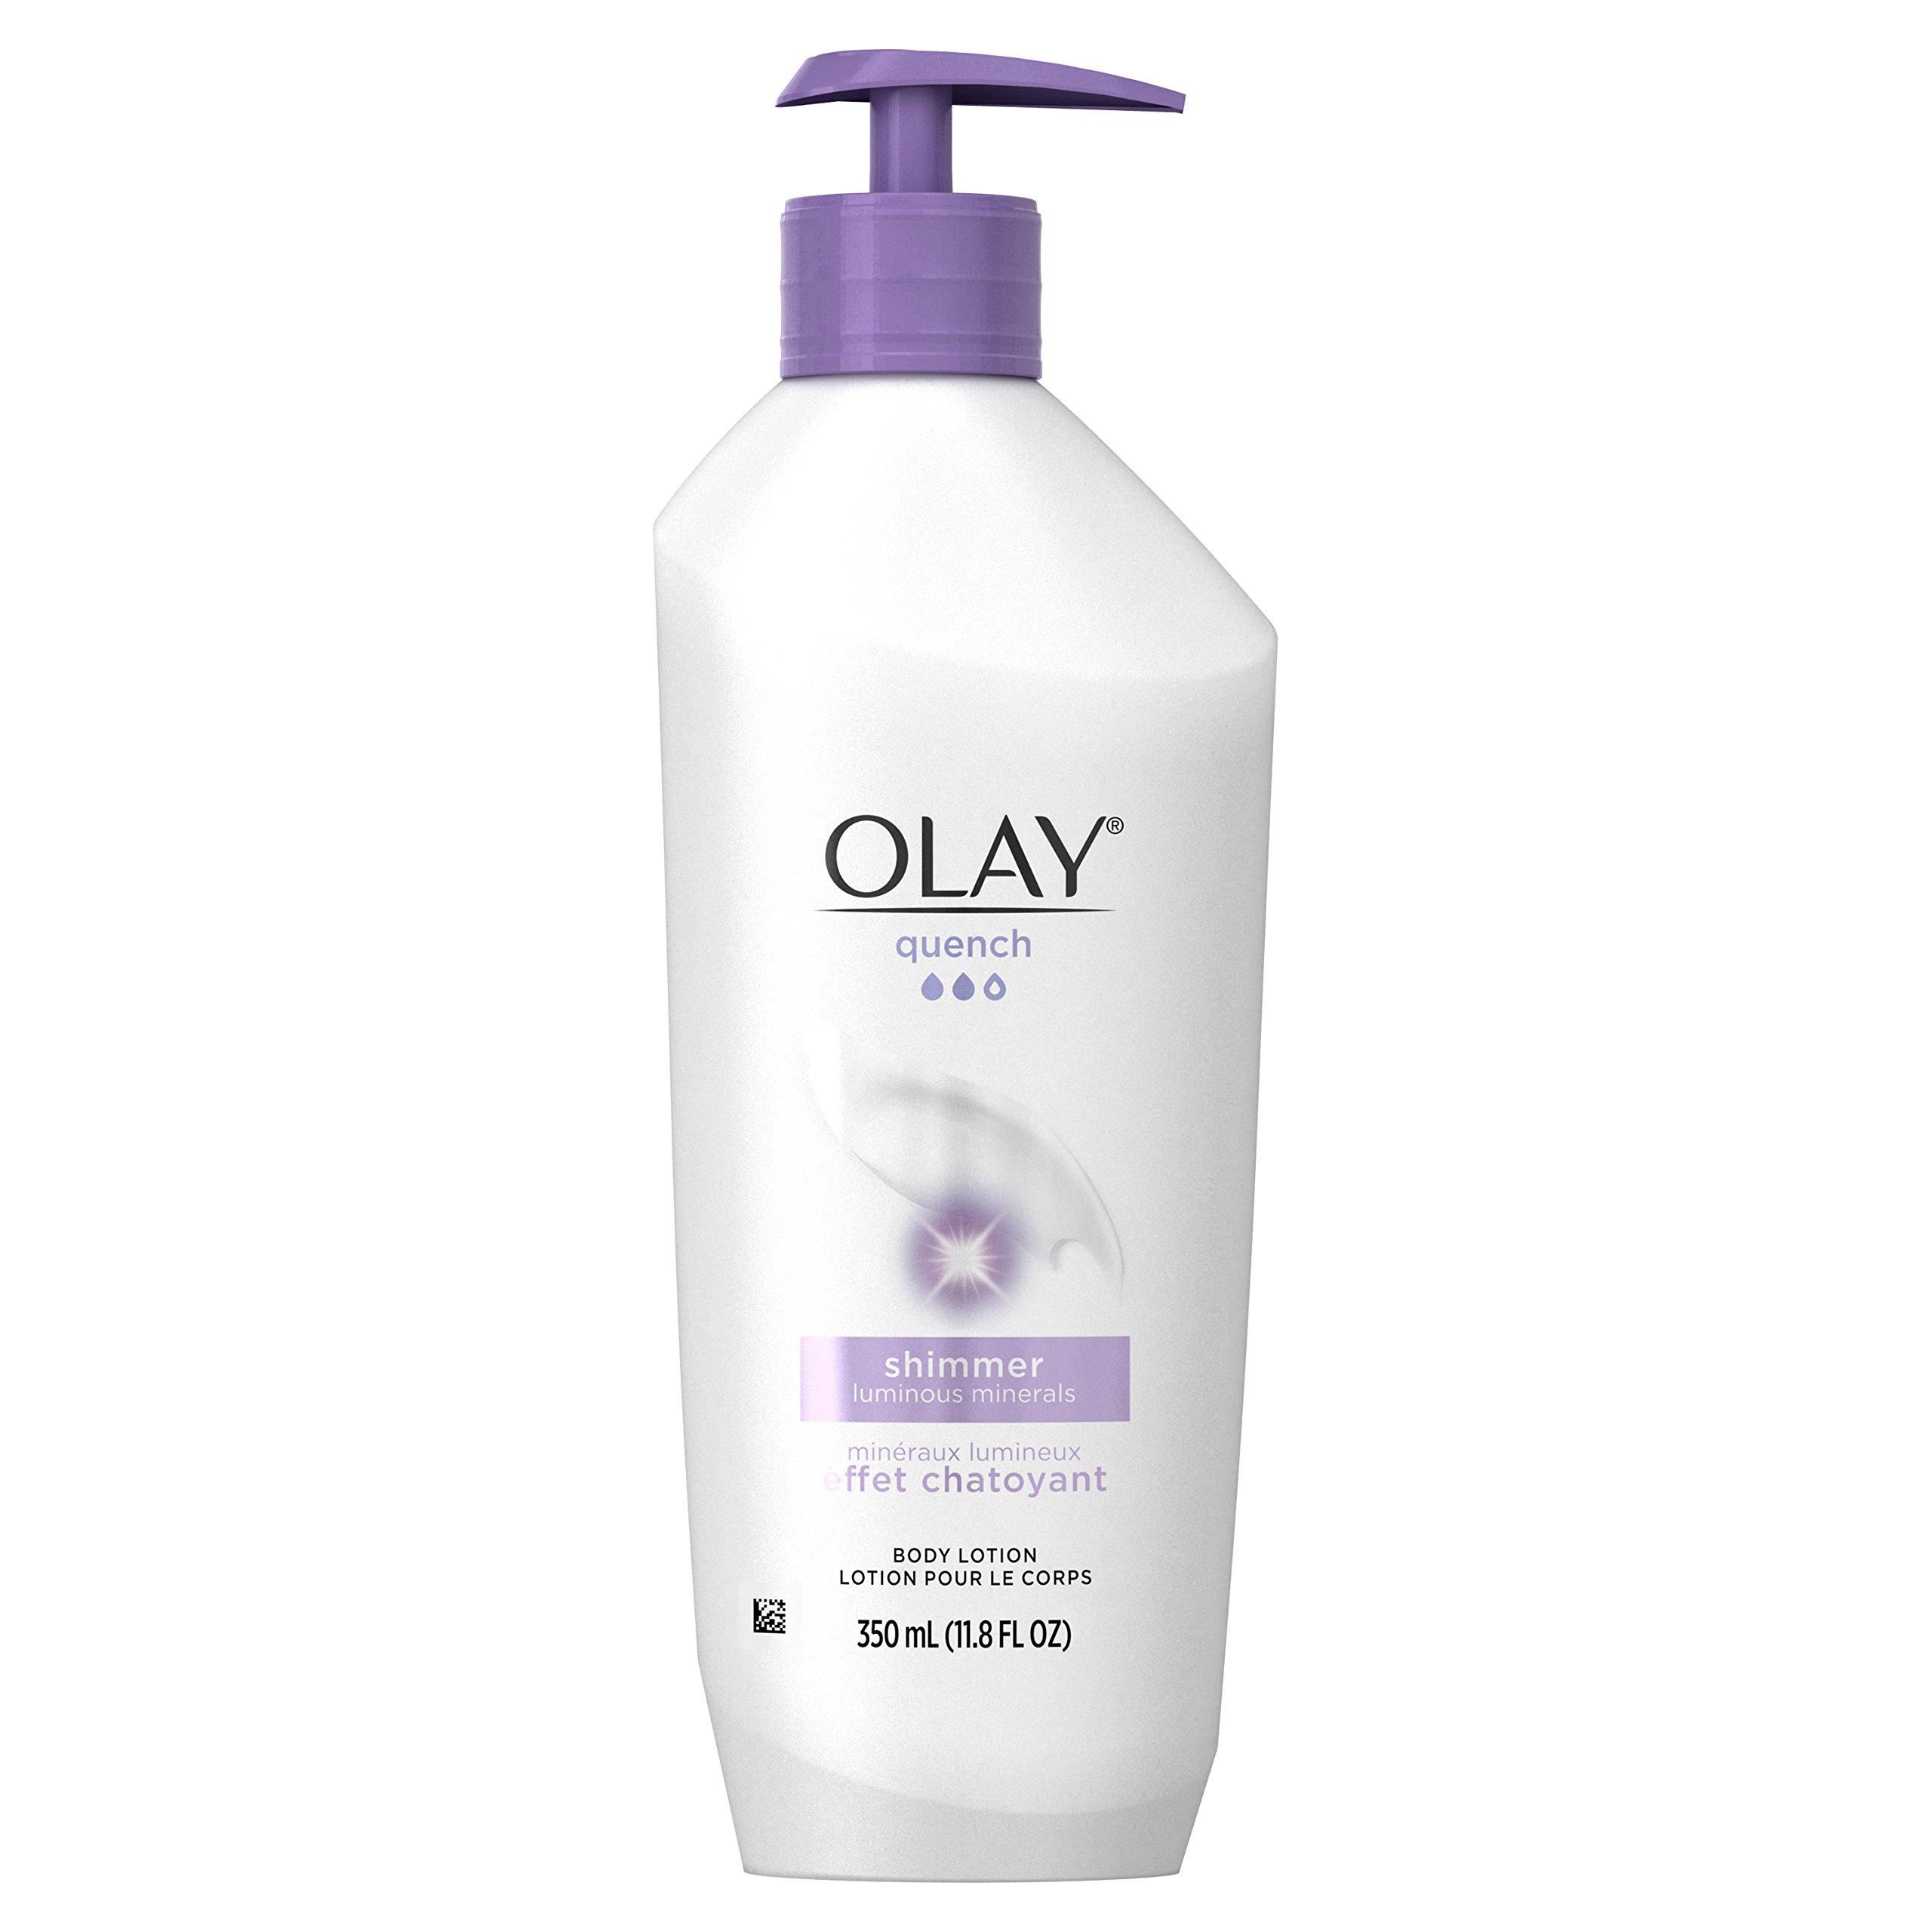 Olay Quench Plus Shimmer Body Lotion, 11.8 Fluid Ounce by Olay